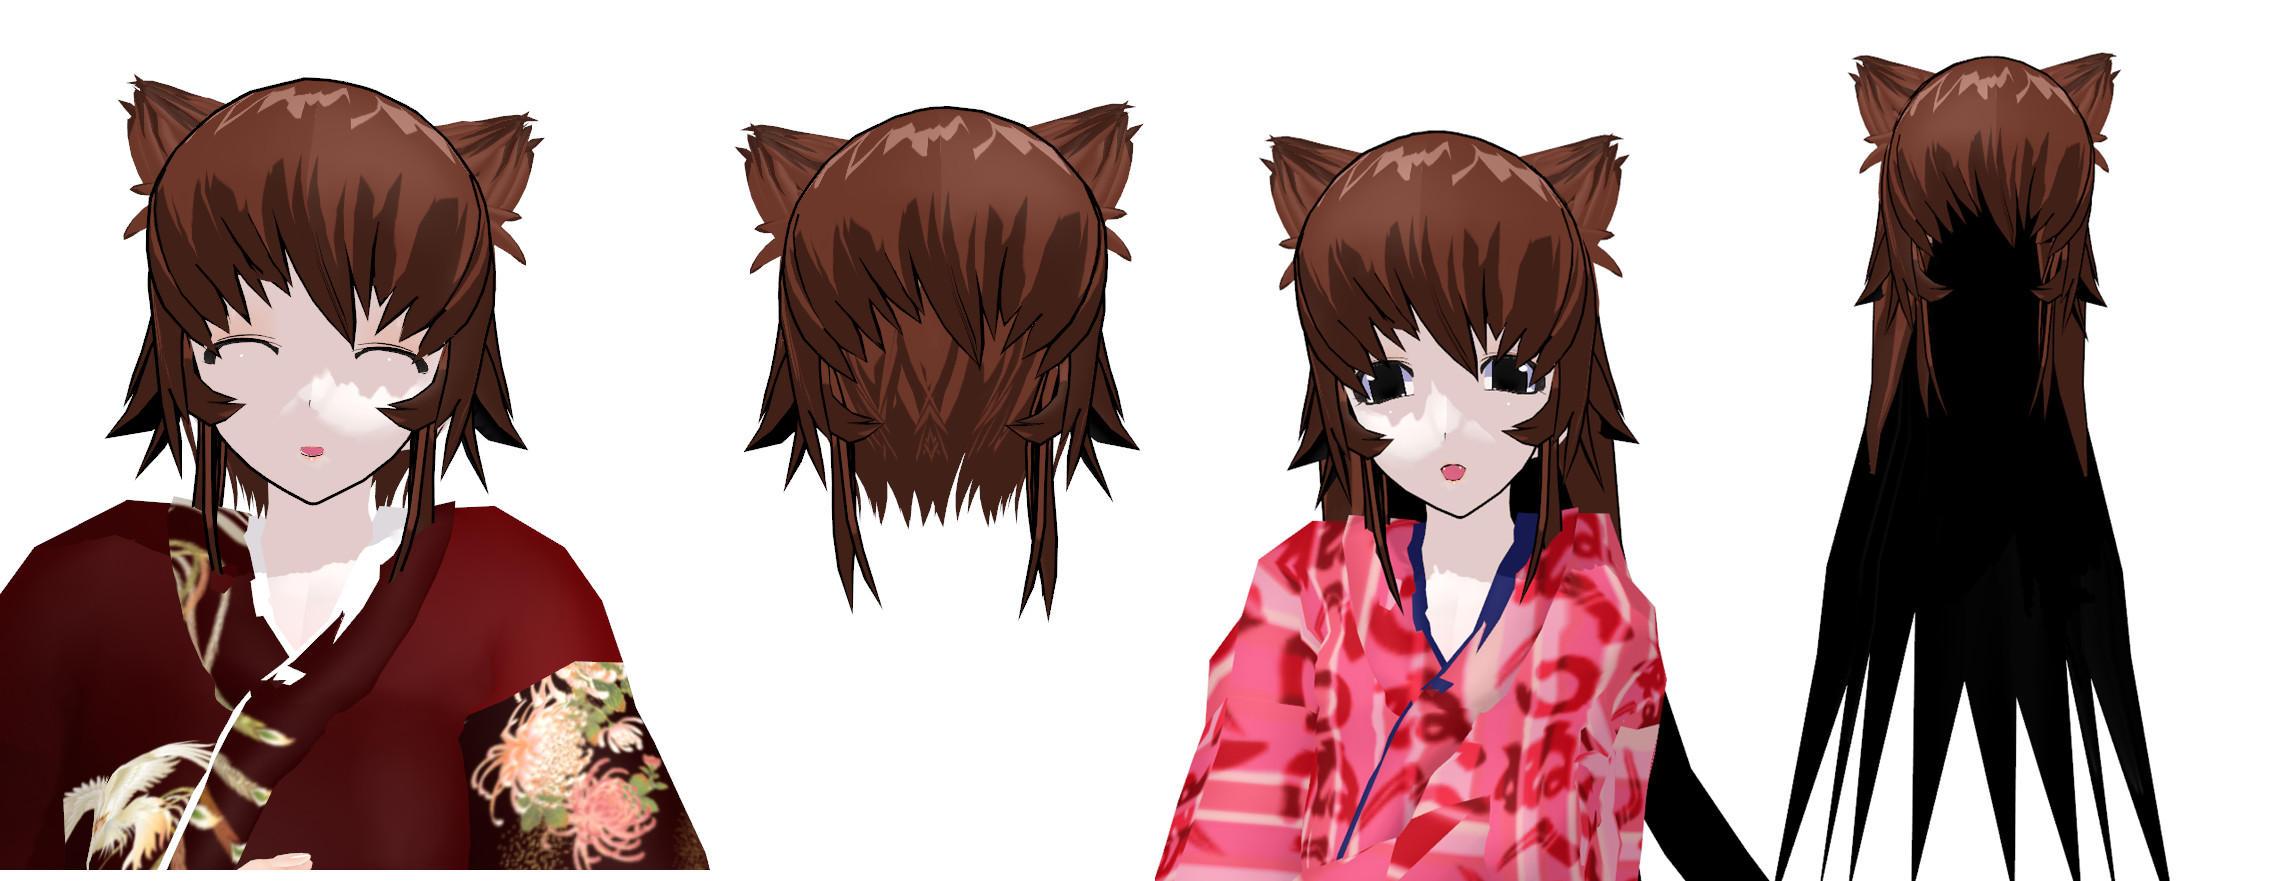 MMD Neko Hair download by 9844